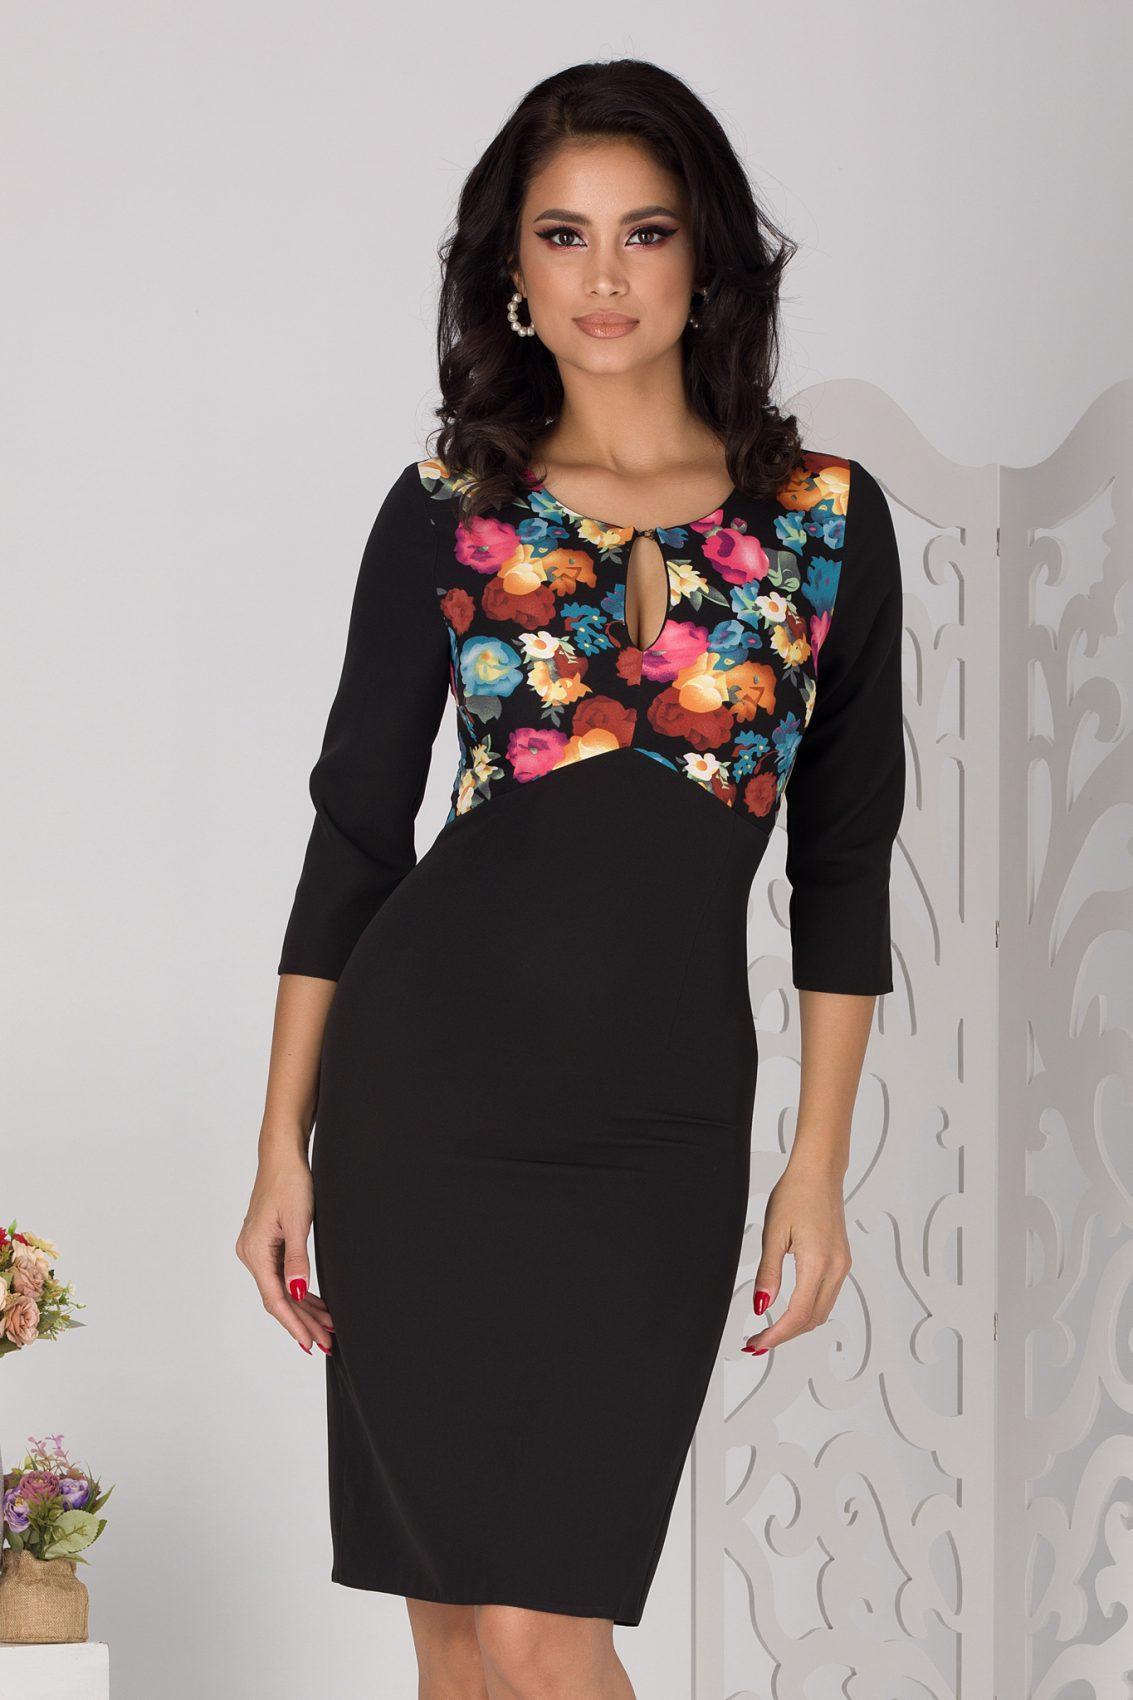 Fabiola Blck Dress